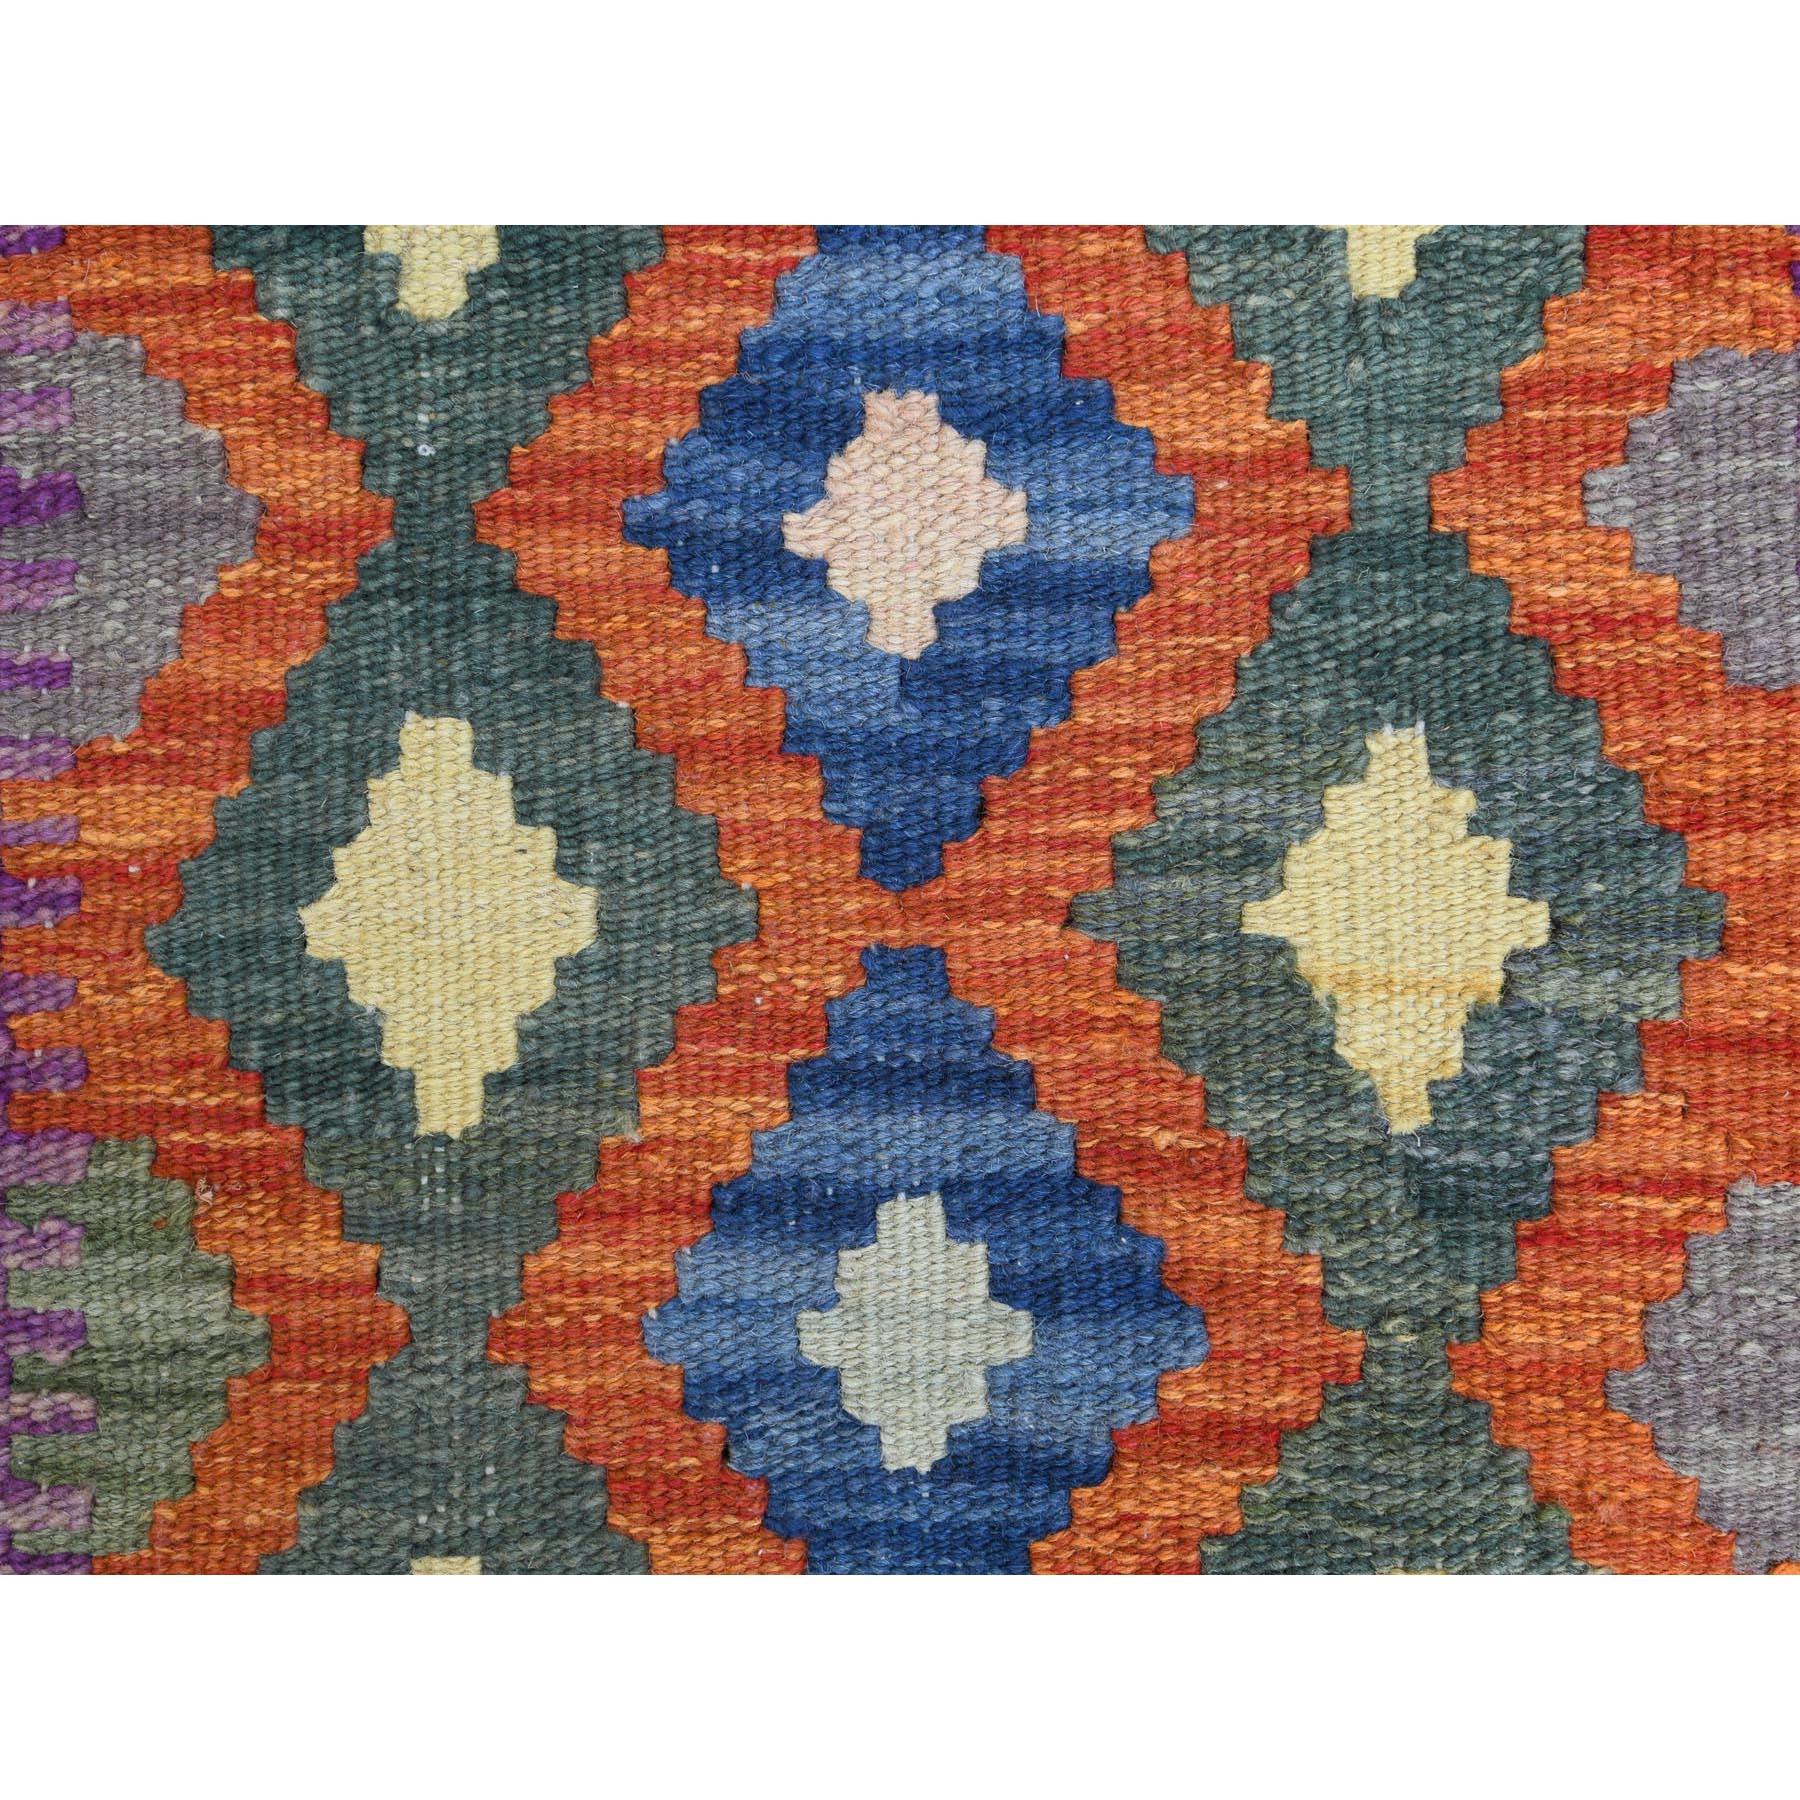 "2'1""x2'9"" Colorful Afghan Kilim Geometric Design Reversible Herbal Wash Pure Wool Hand Woven Oriental Rug"